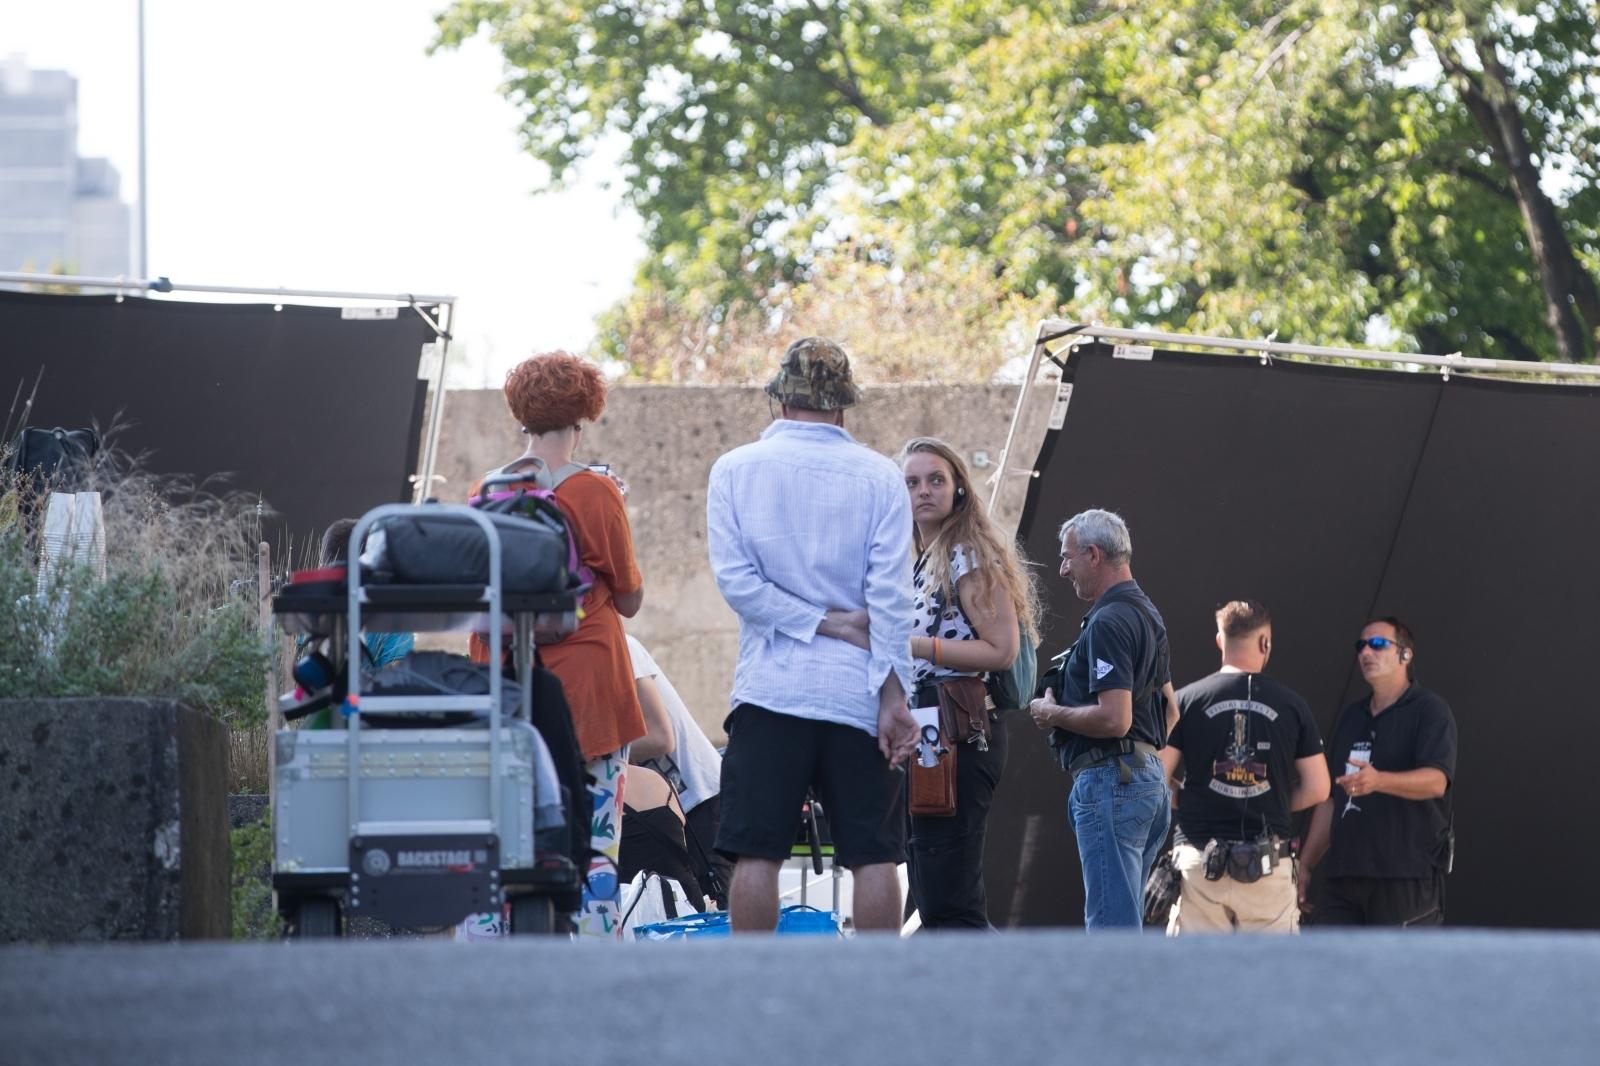 STRIKE BACK PONOVNO U ZAGREBU – Nove scene snimaju se na Vrbiku